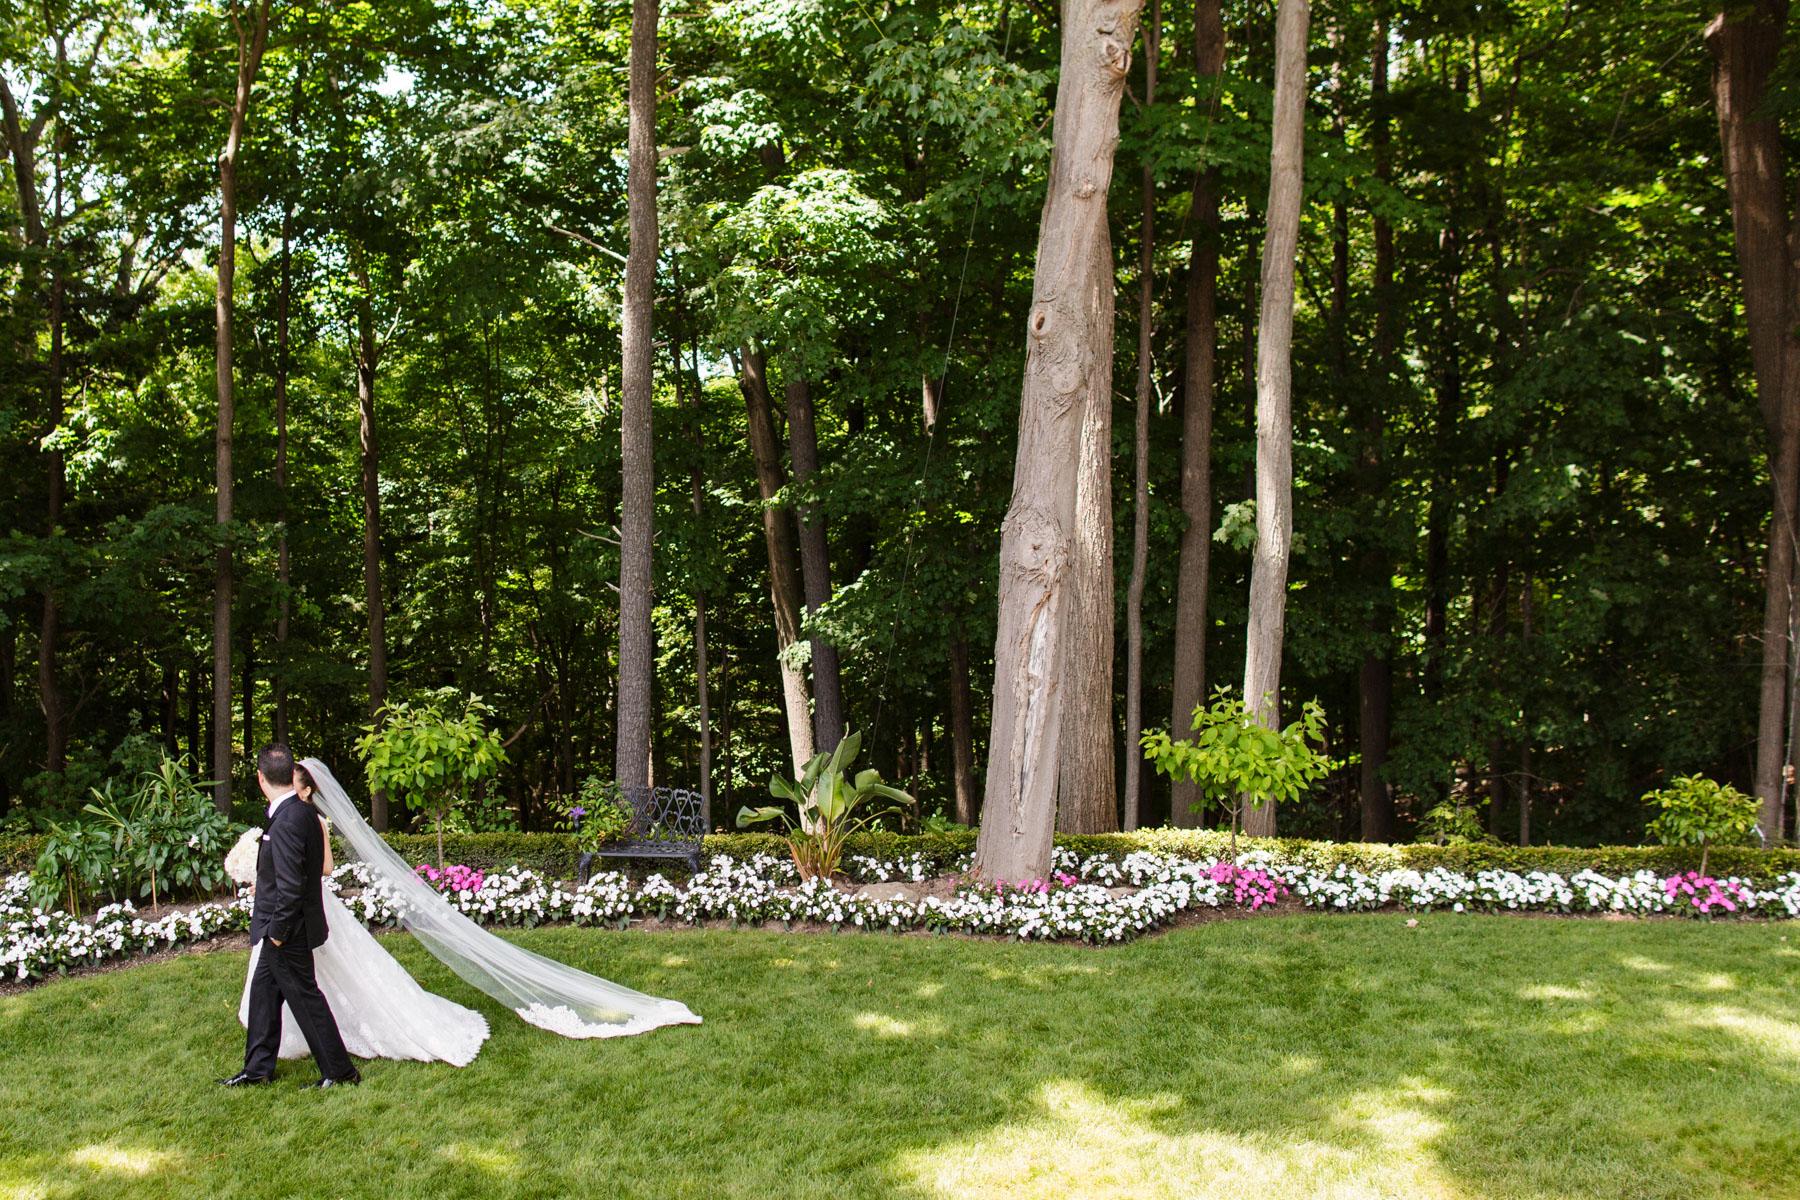 joeewong-chdi-toronto-liberty-grand-wedding-214